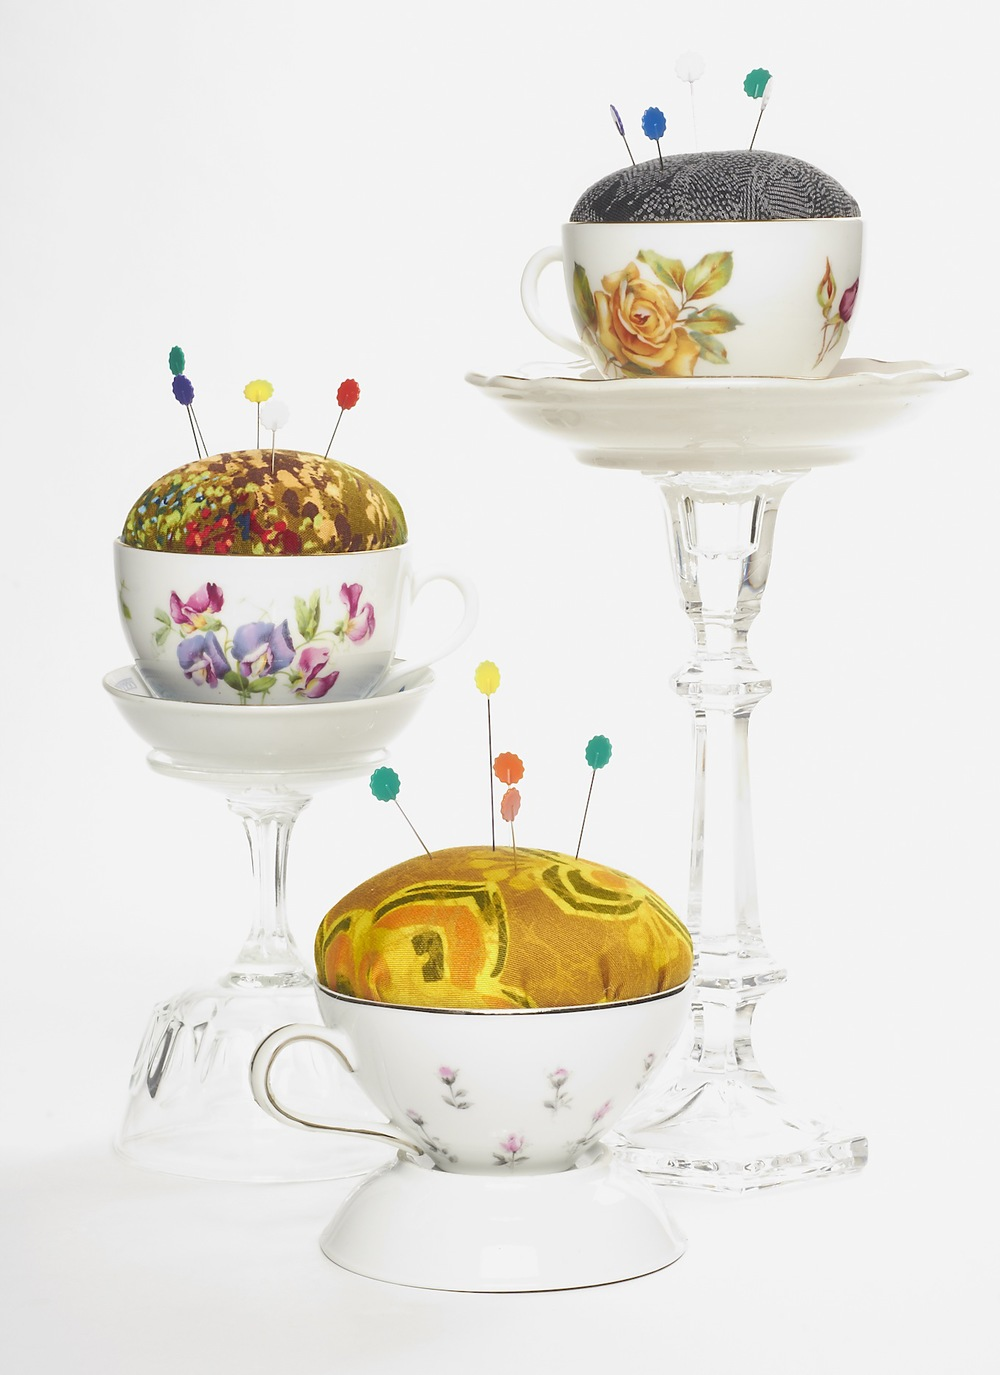 AFTER: Tea Cup Pincushions